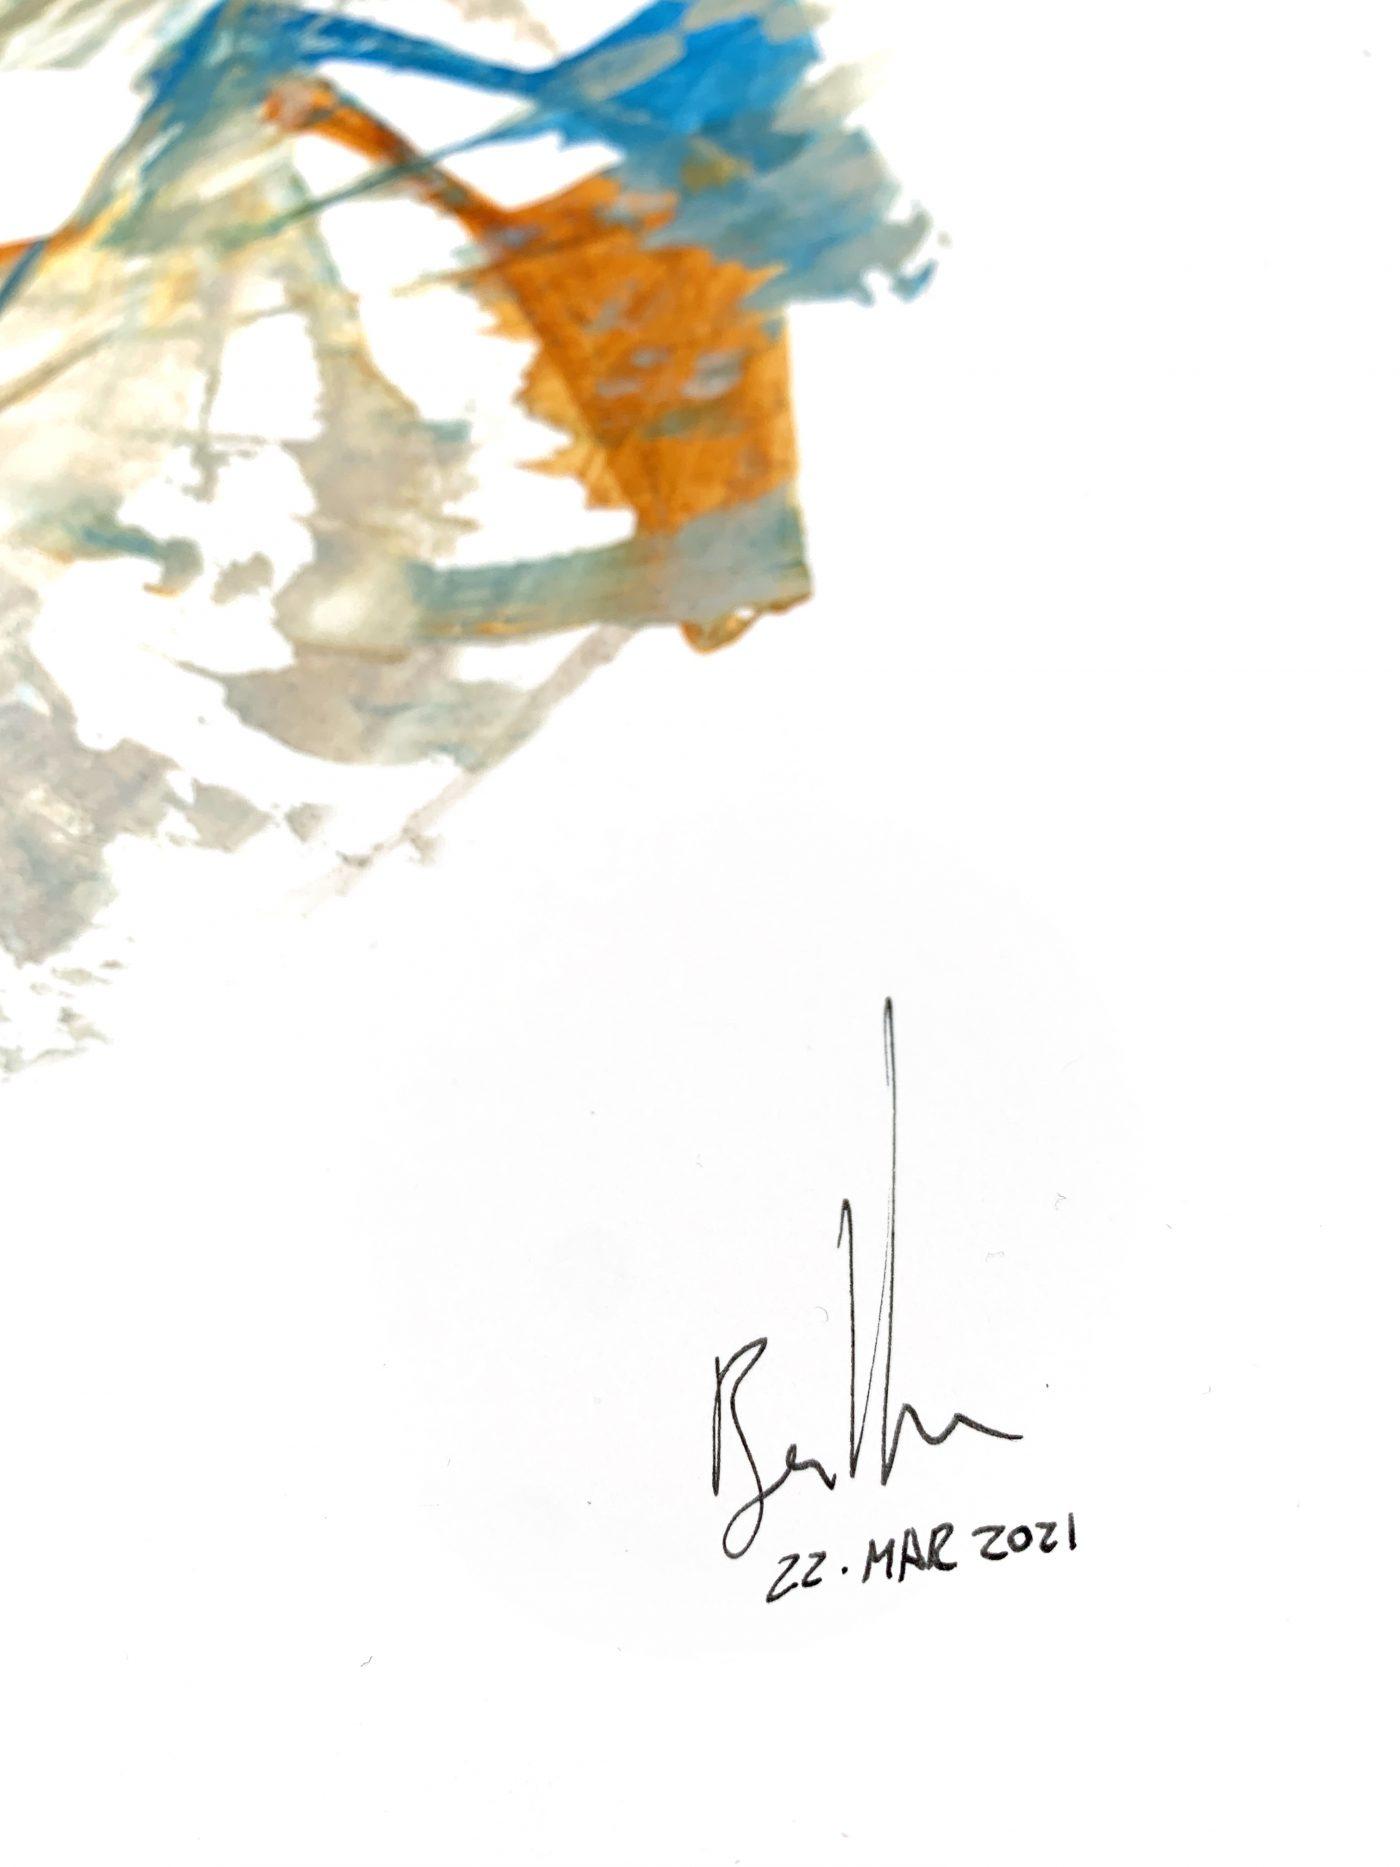 x447 - 22 Mar 2021